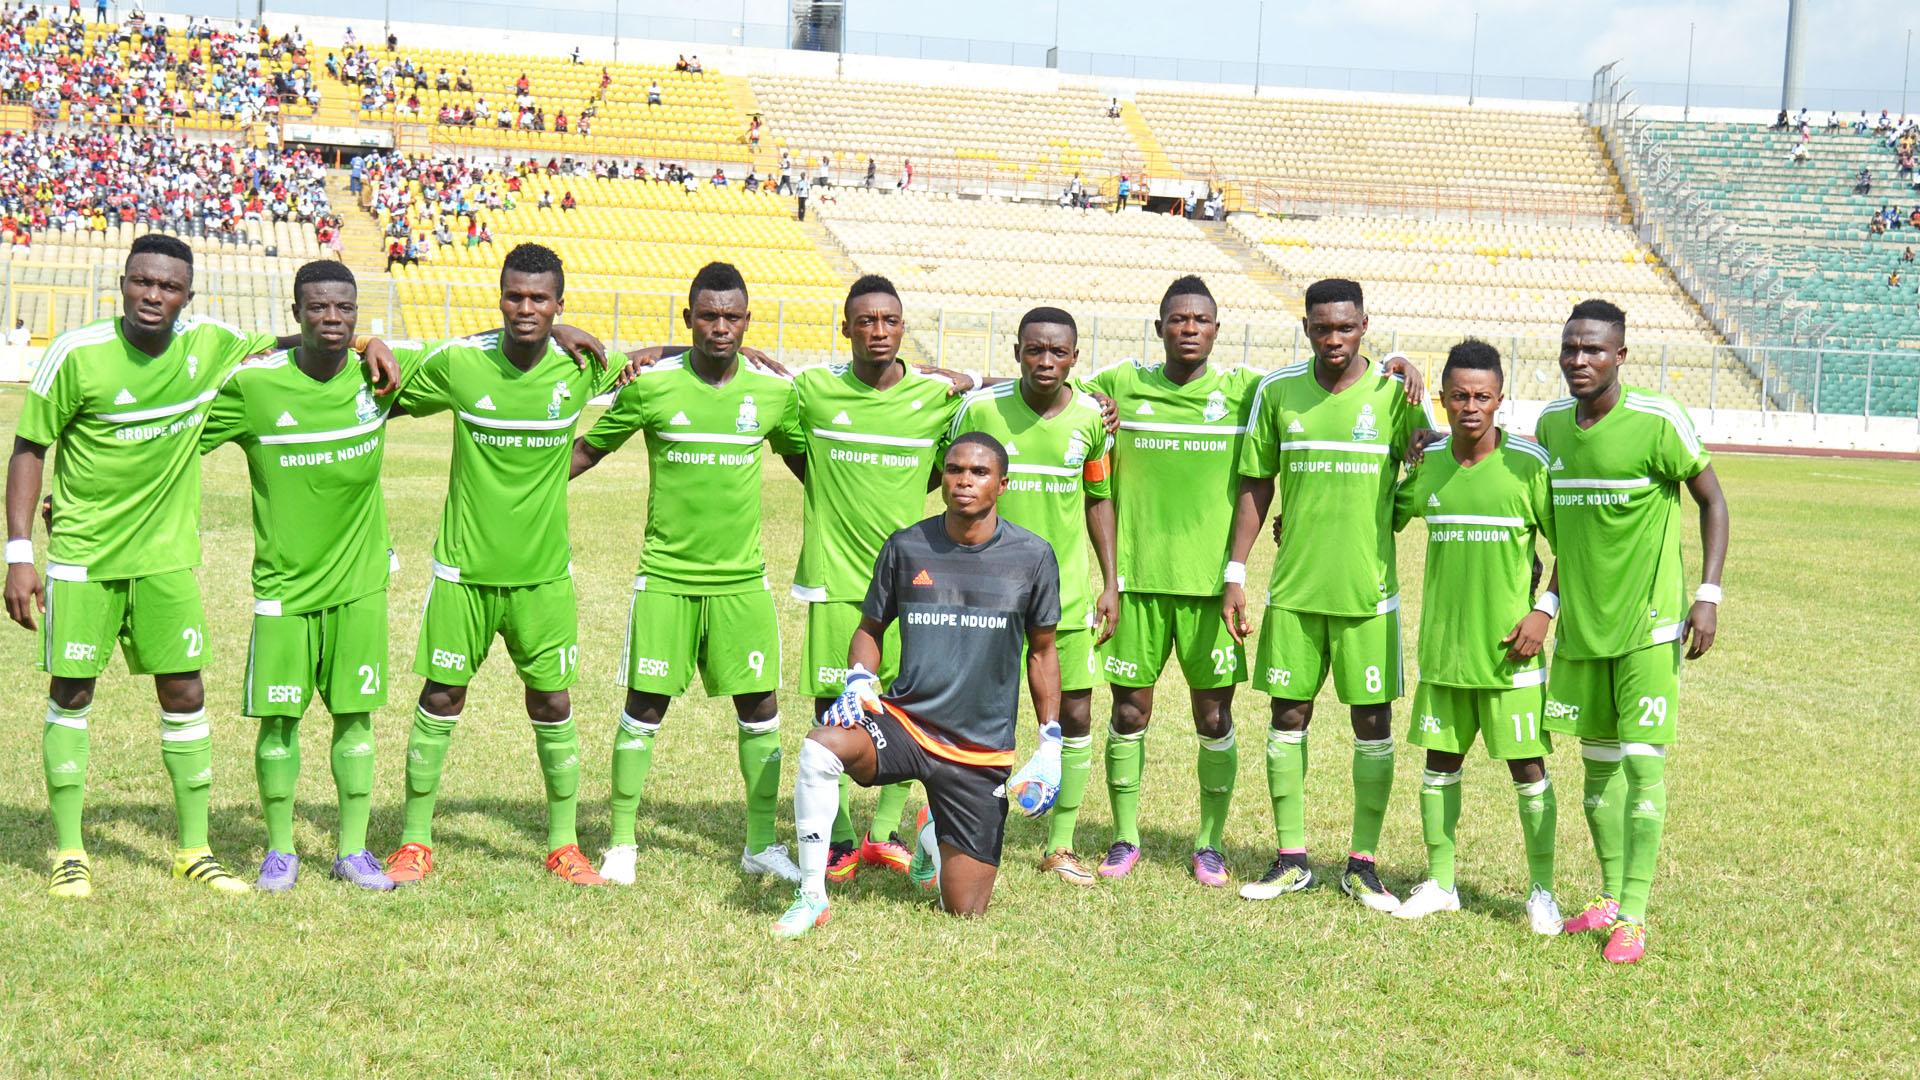 Ghana Premier League matchday 13 report: Elmina Sharks earn comfortable 3-1 win over Liberty